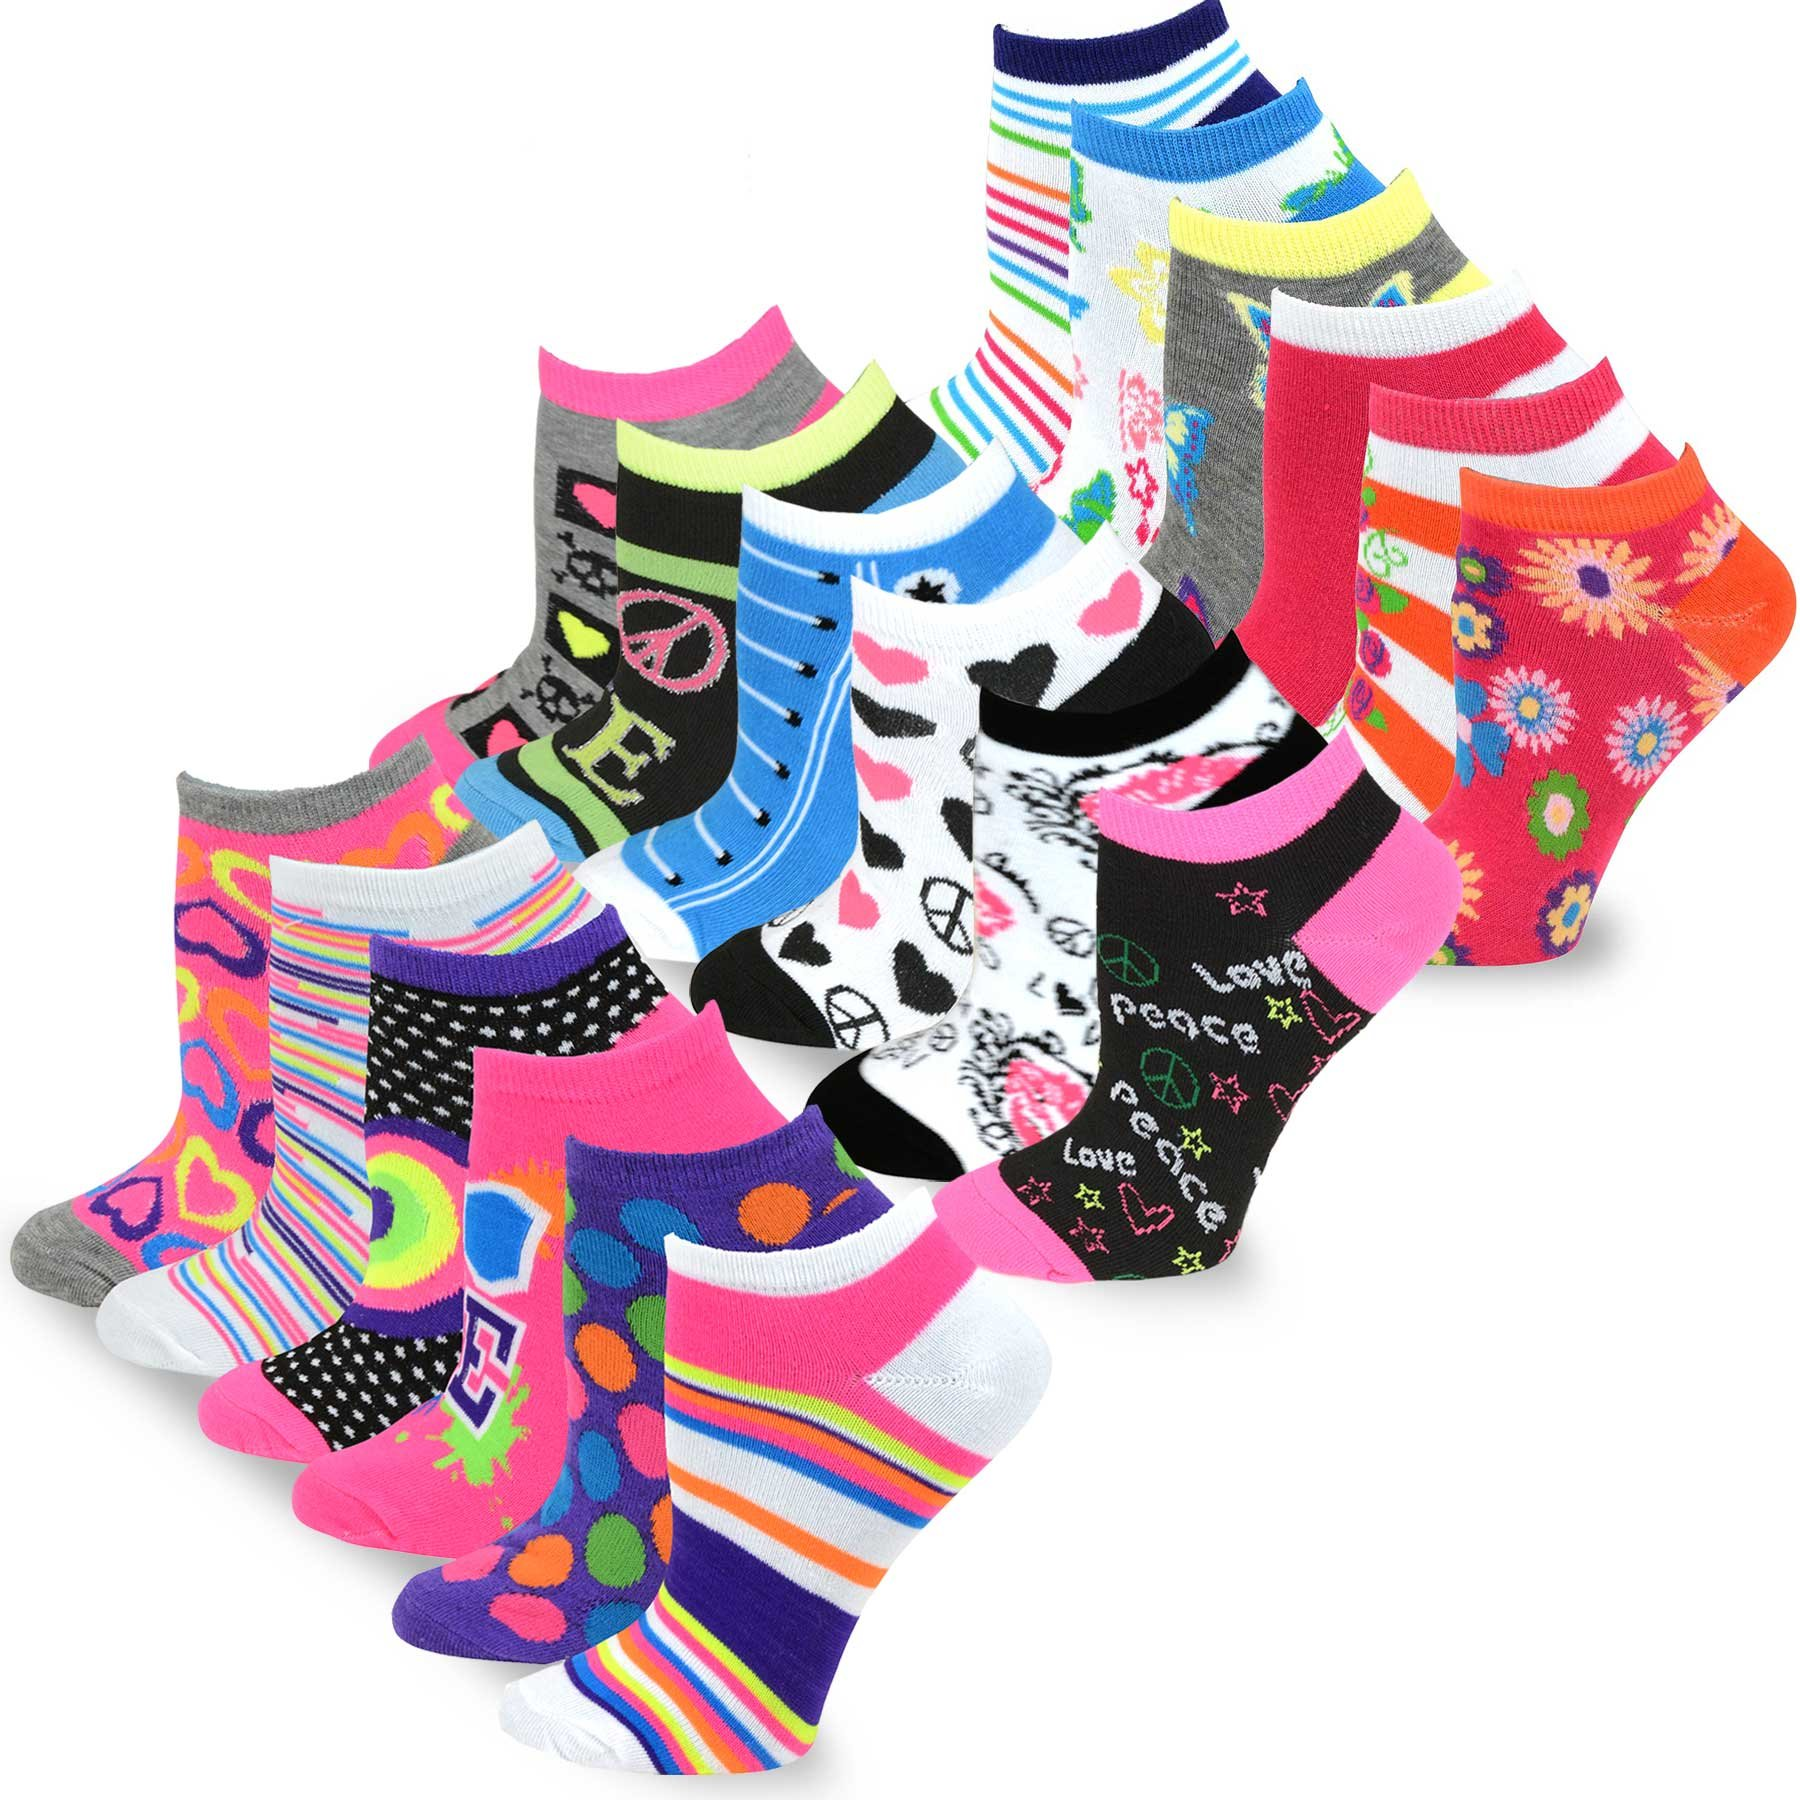 TeeHee Women's Fashion No Show Fun Socks 18 Pairs Packs (Love Peace)  9-11